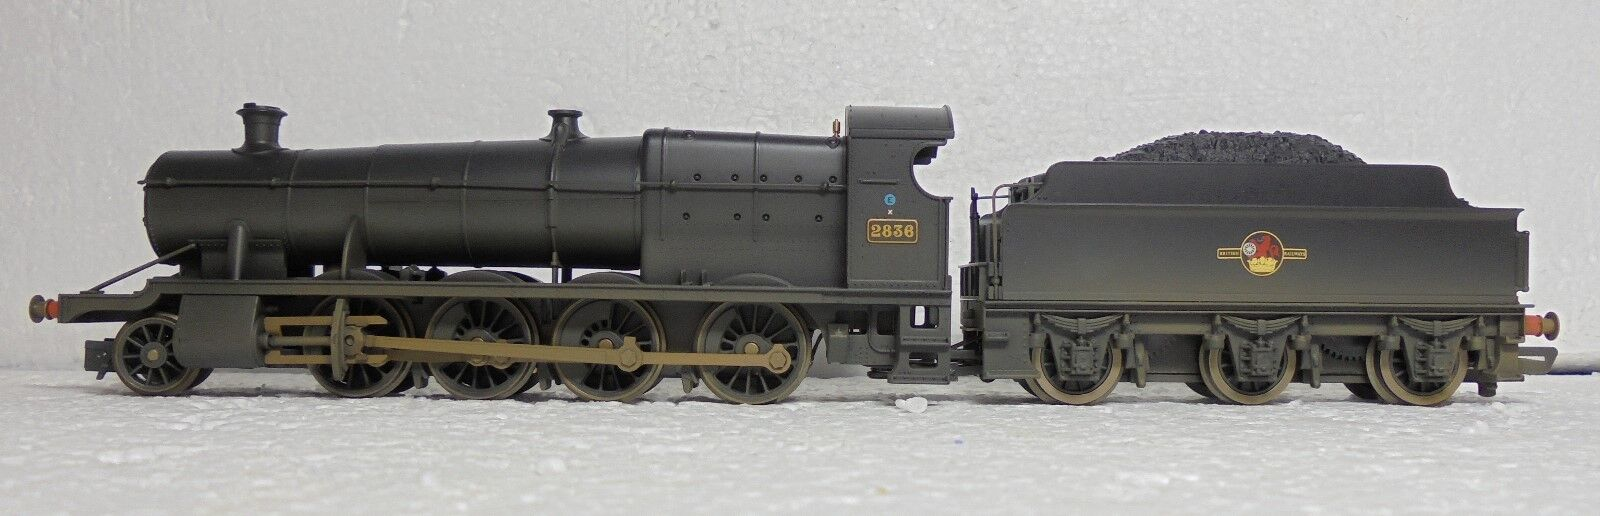 Hornby r3576 diesellok barrington light railway sentinel 4wdh nr. 19.